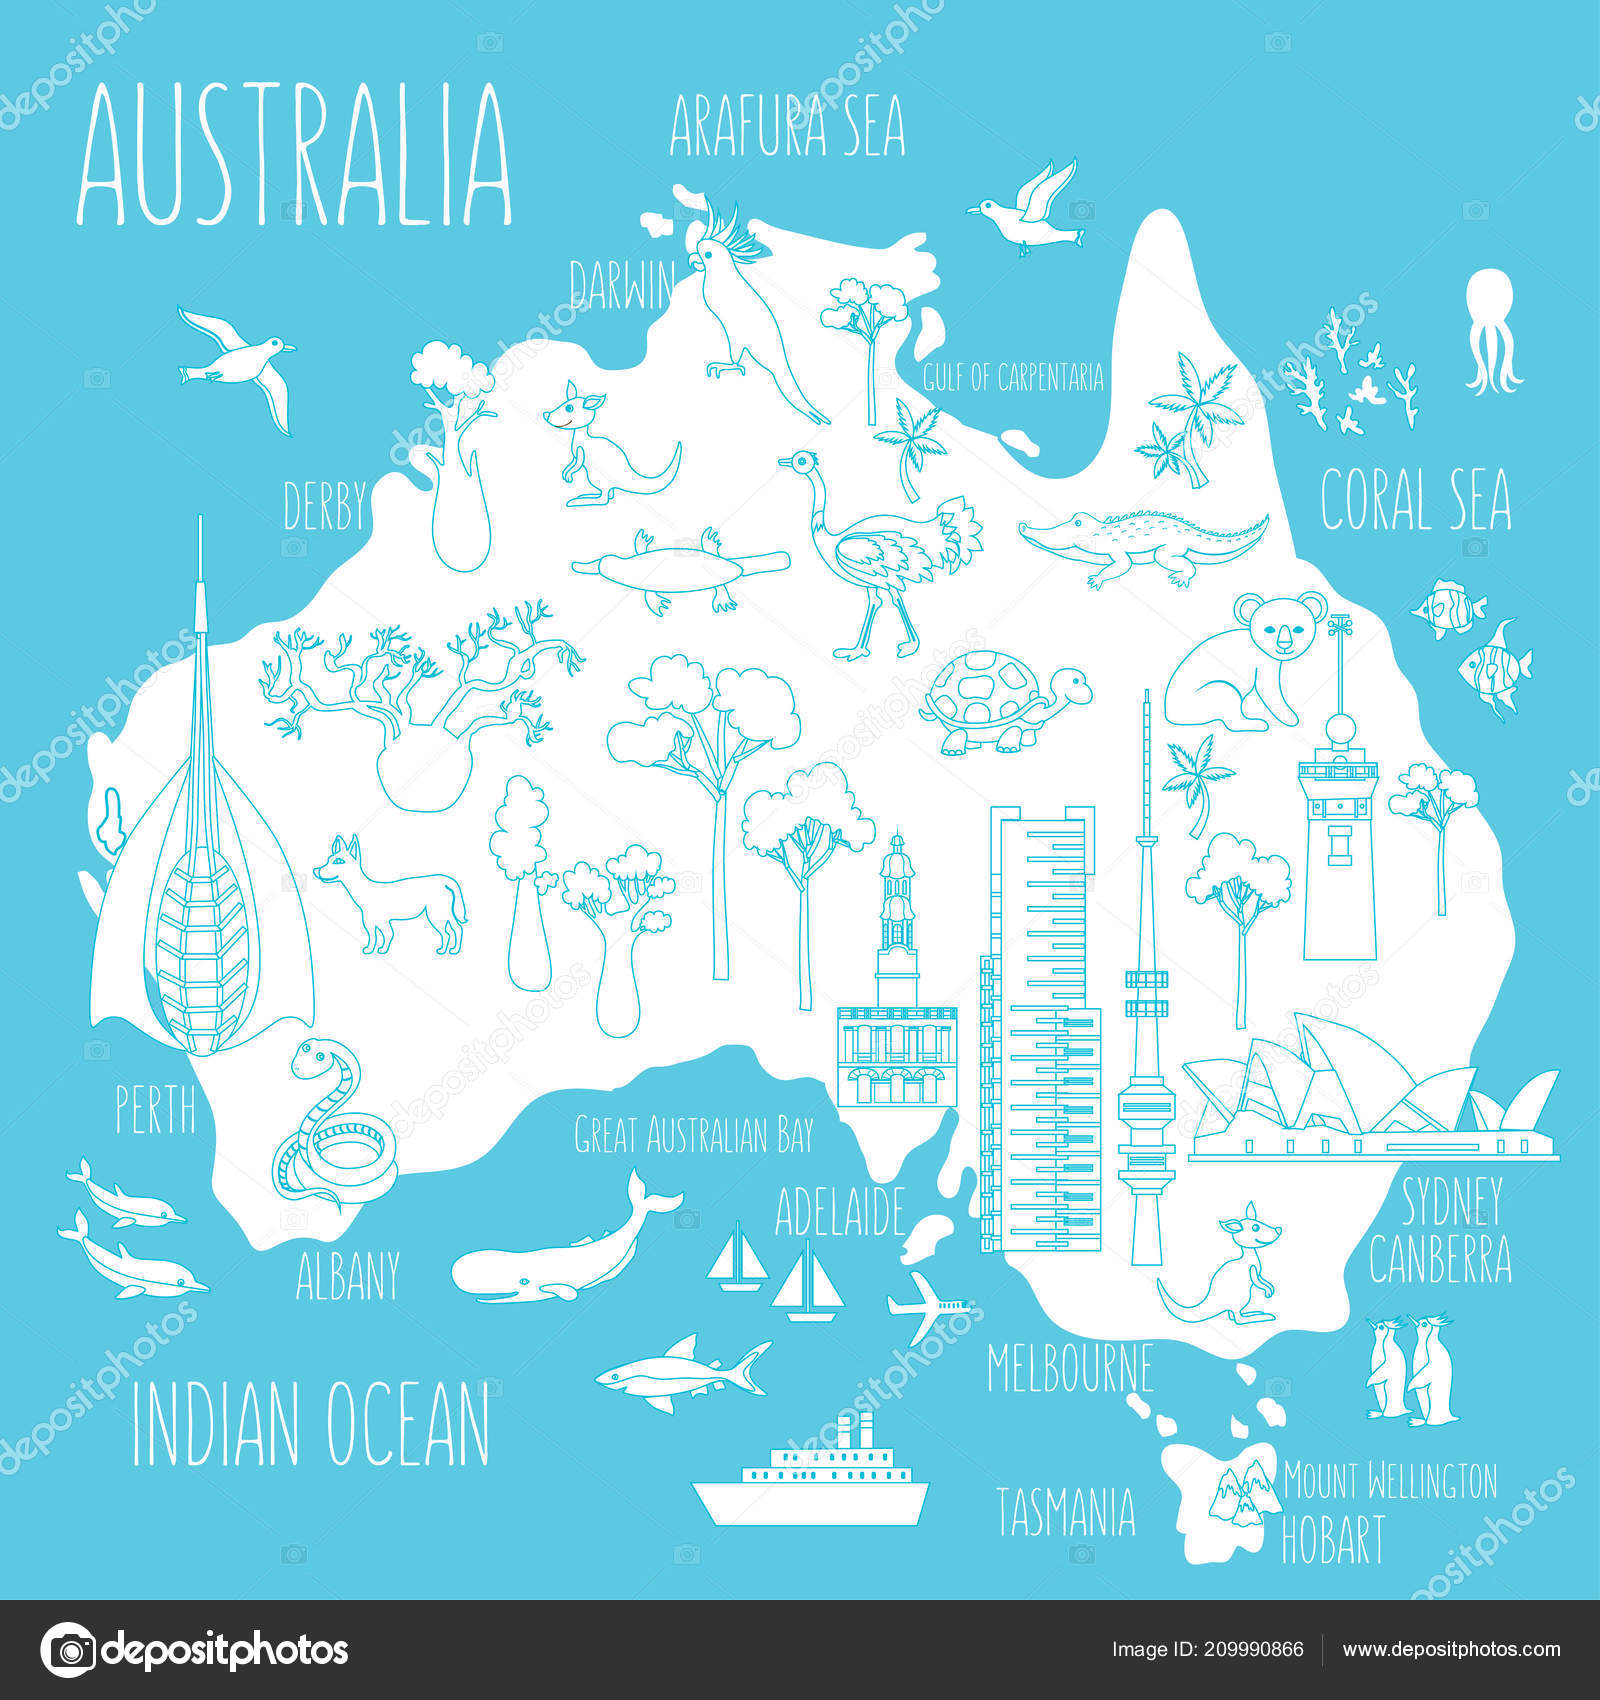 Brisbane Map Australia.Australia Cartoon Travel Map Vector Illustration Landmark Telstra